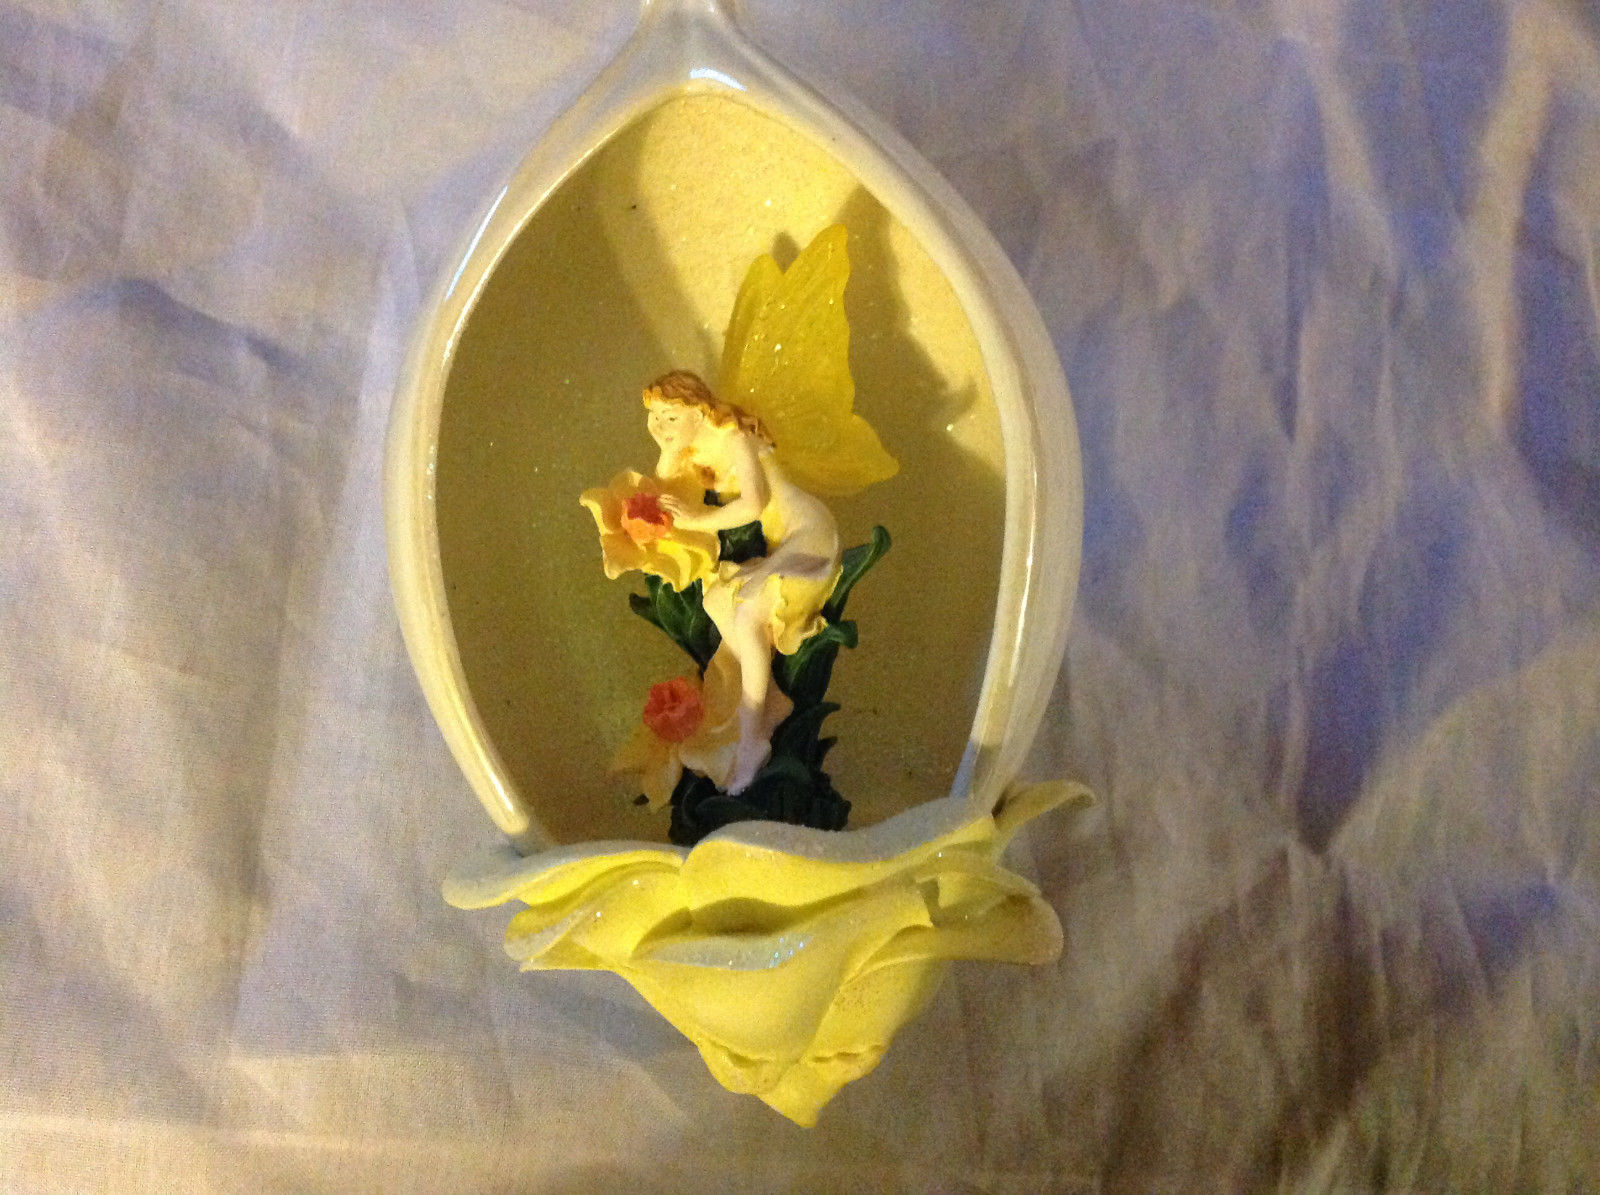 Bradford Editions Heirloom Porcelain Flower Fairy Ornament Ribbon for Hanging